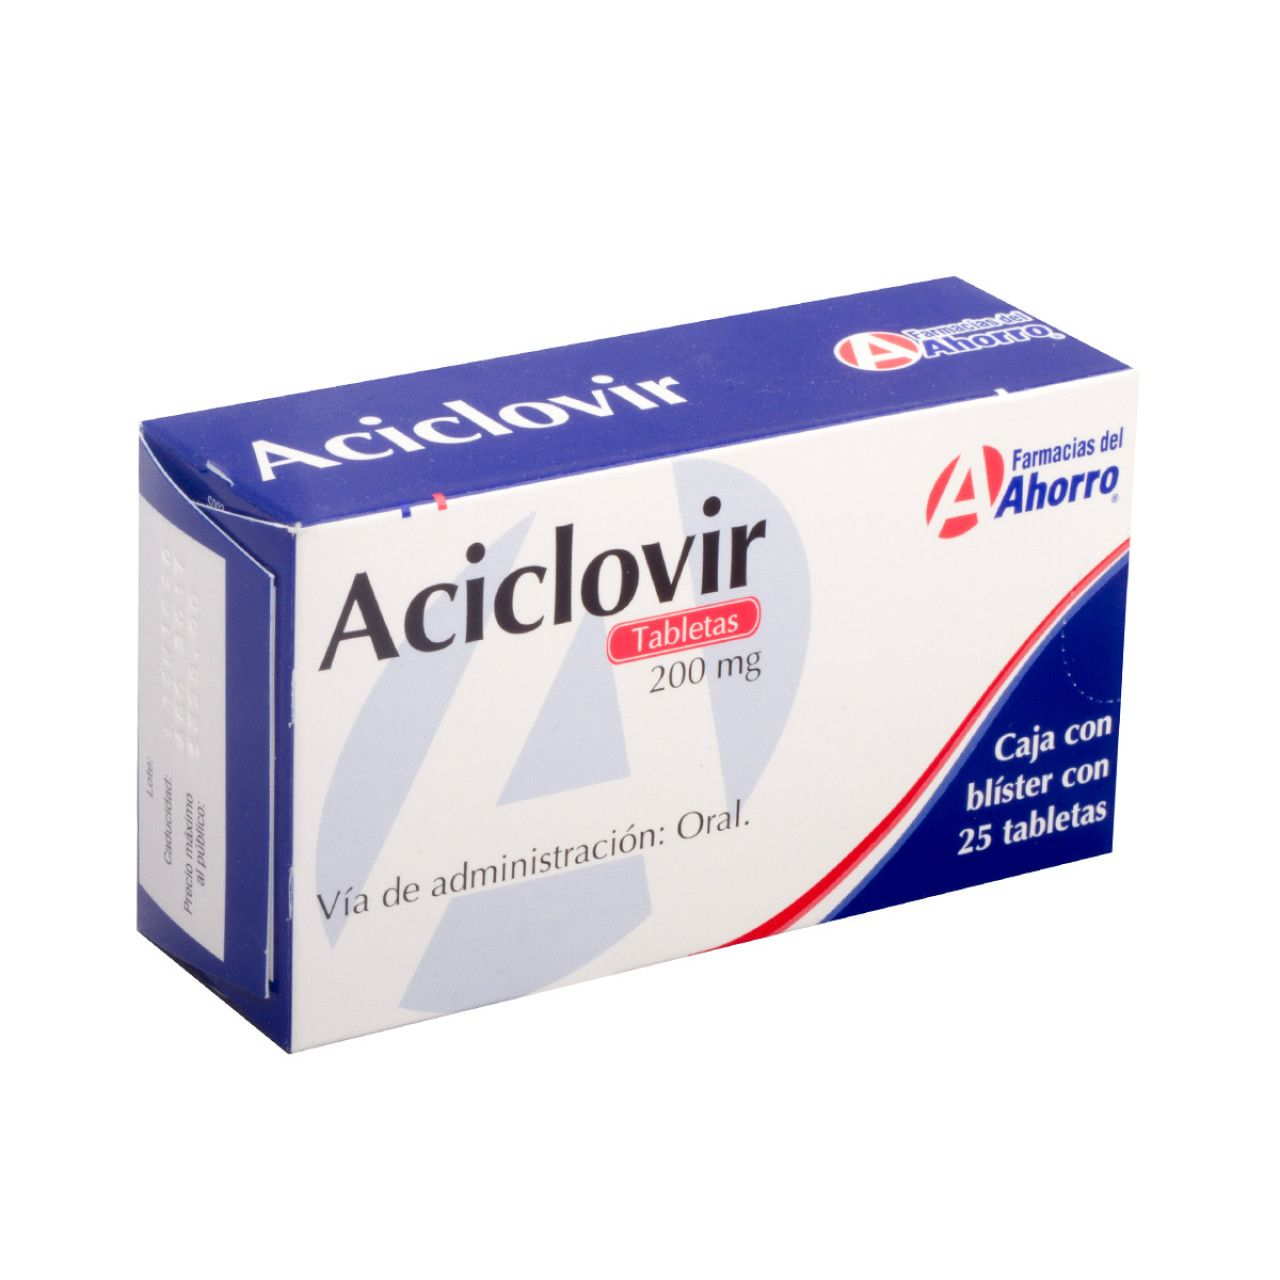 aciclovir hpv treatment